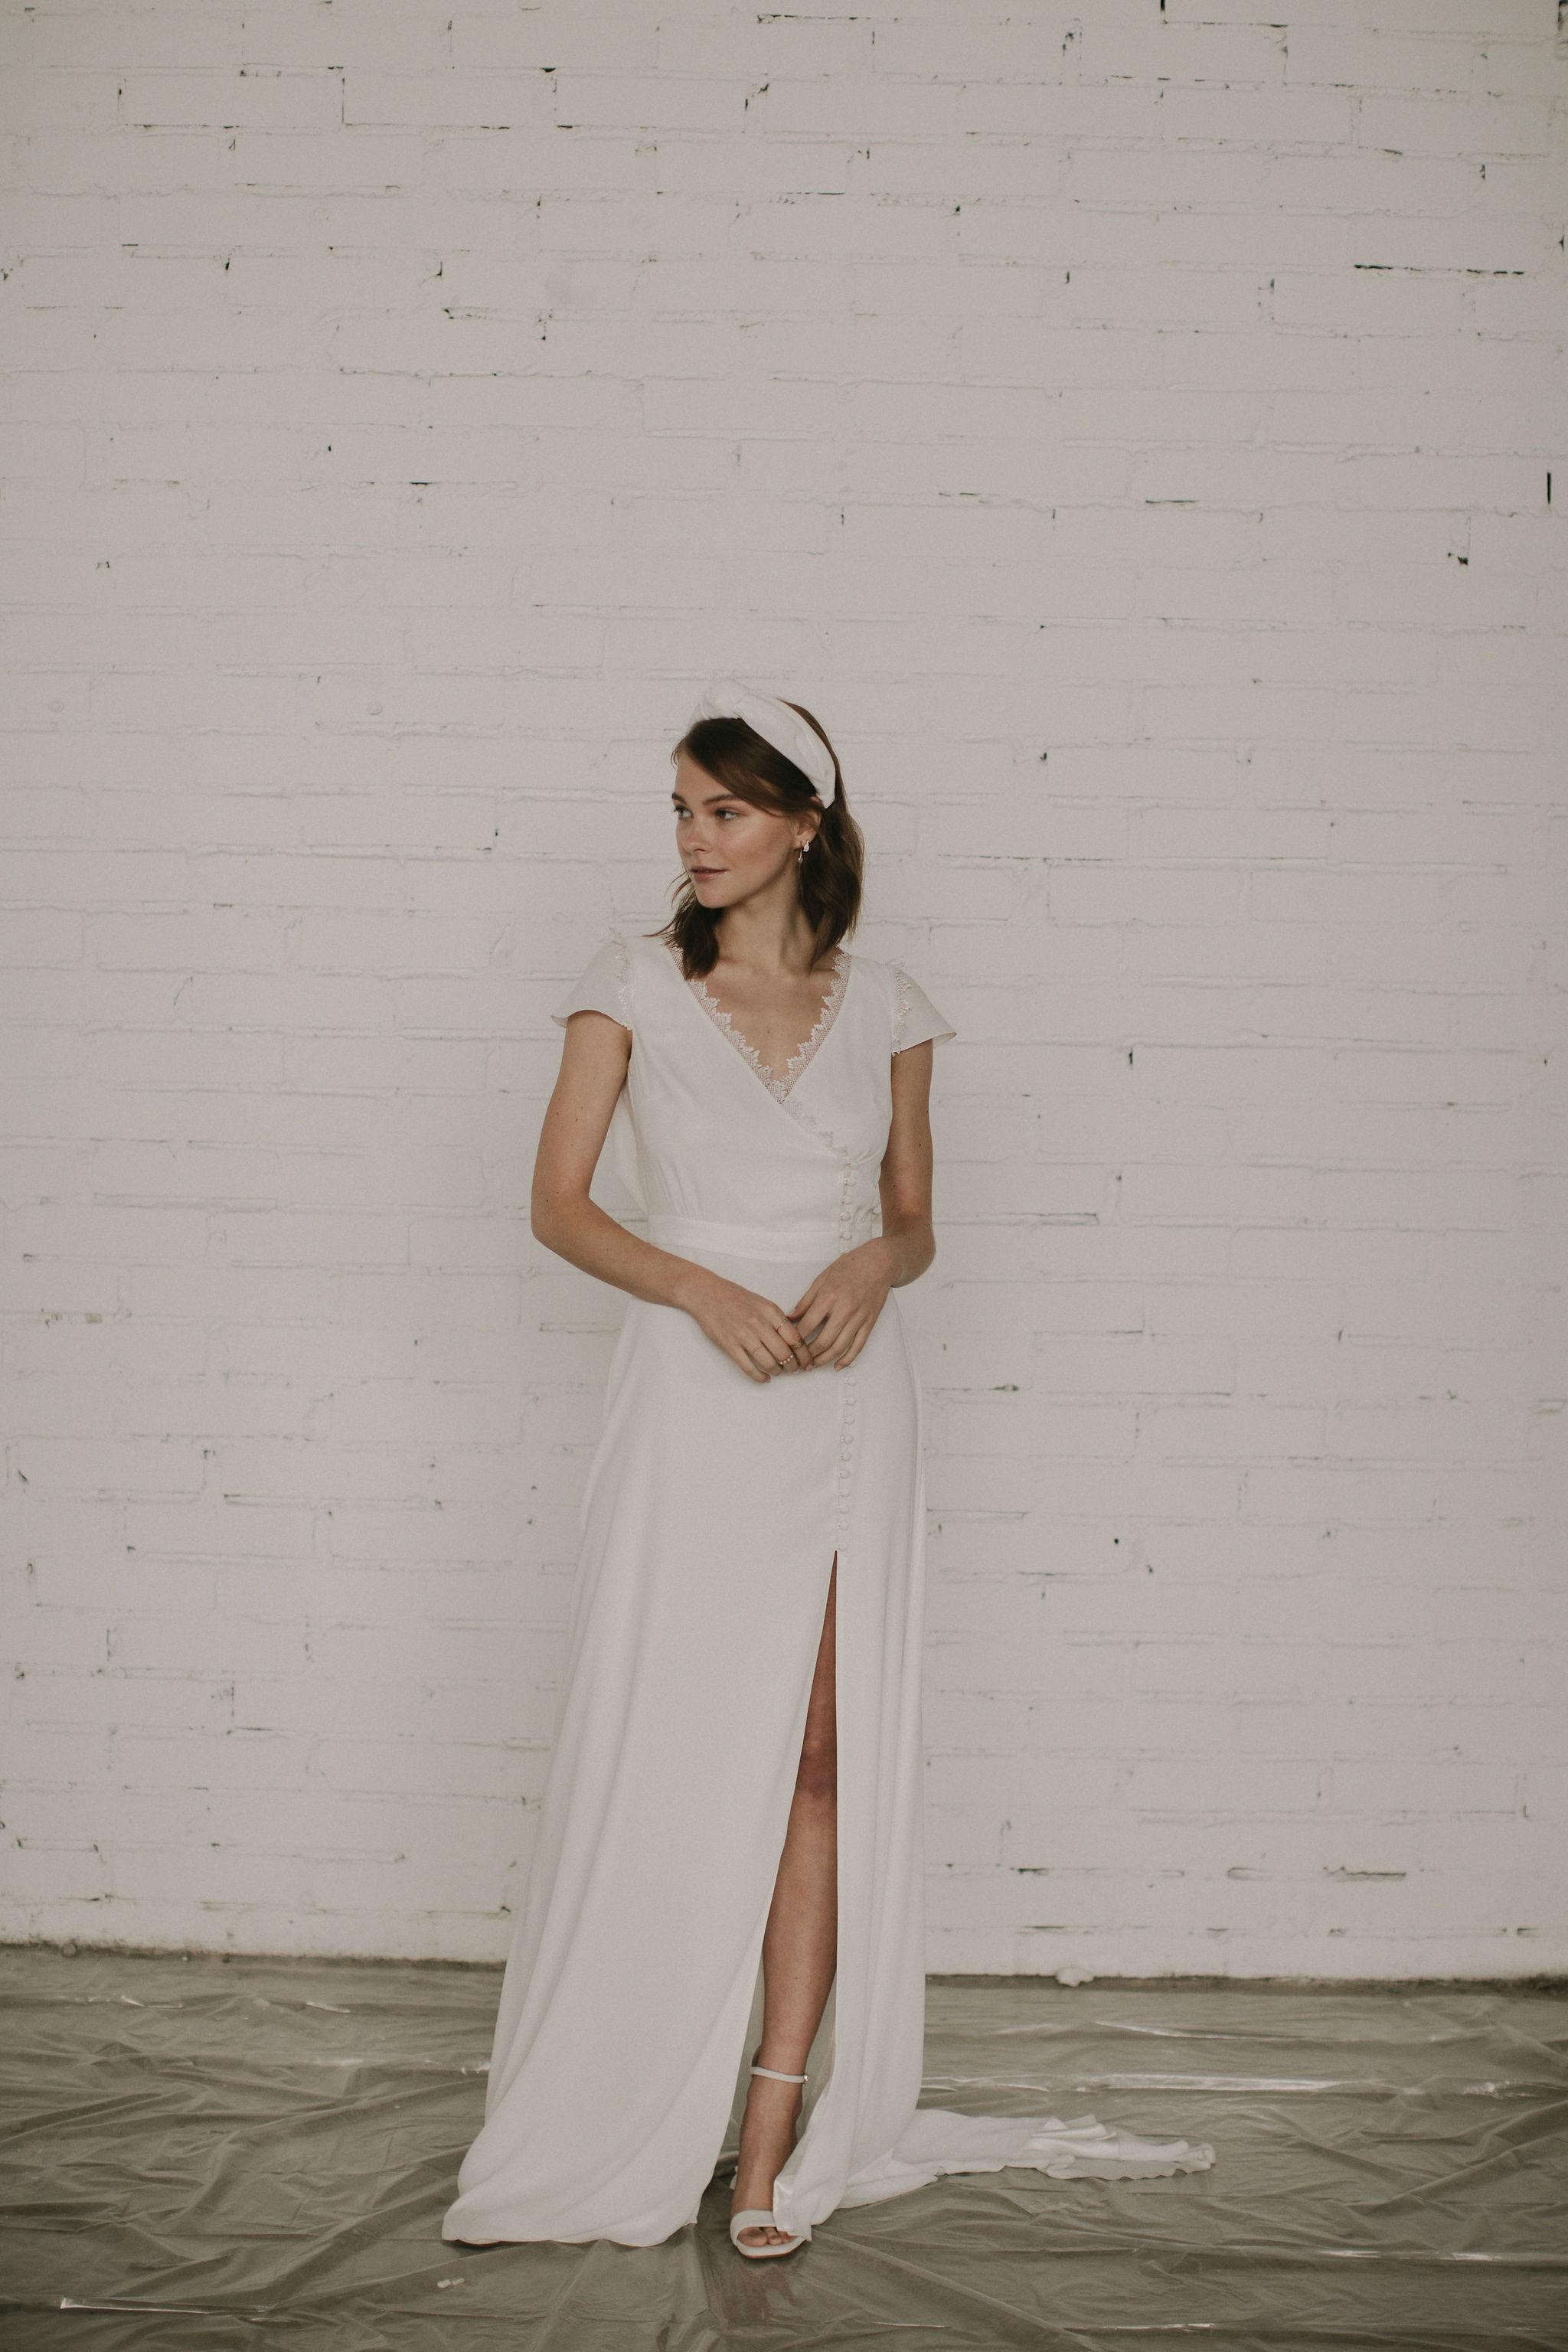 modern cool wedding dresses for the boho bride ireland